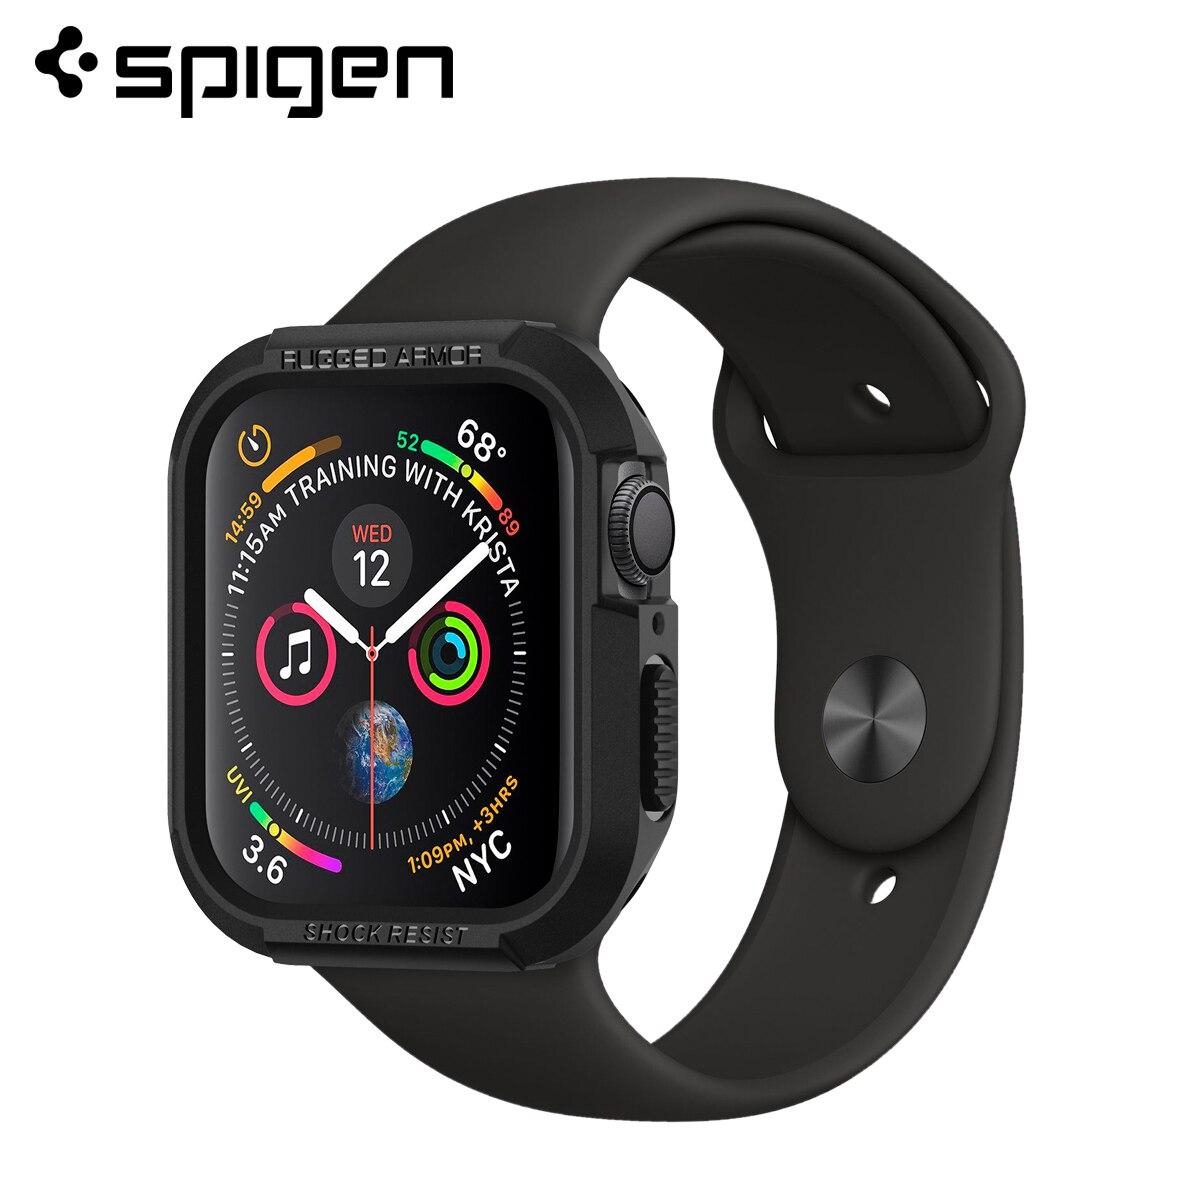 Spigen Rugged Armor Case For Apple Watch Series 5 / 4  Flexible Soft TPU Matte Black Cases 44mm 40mm